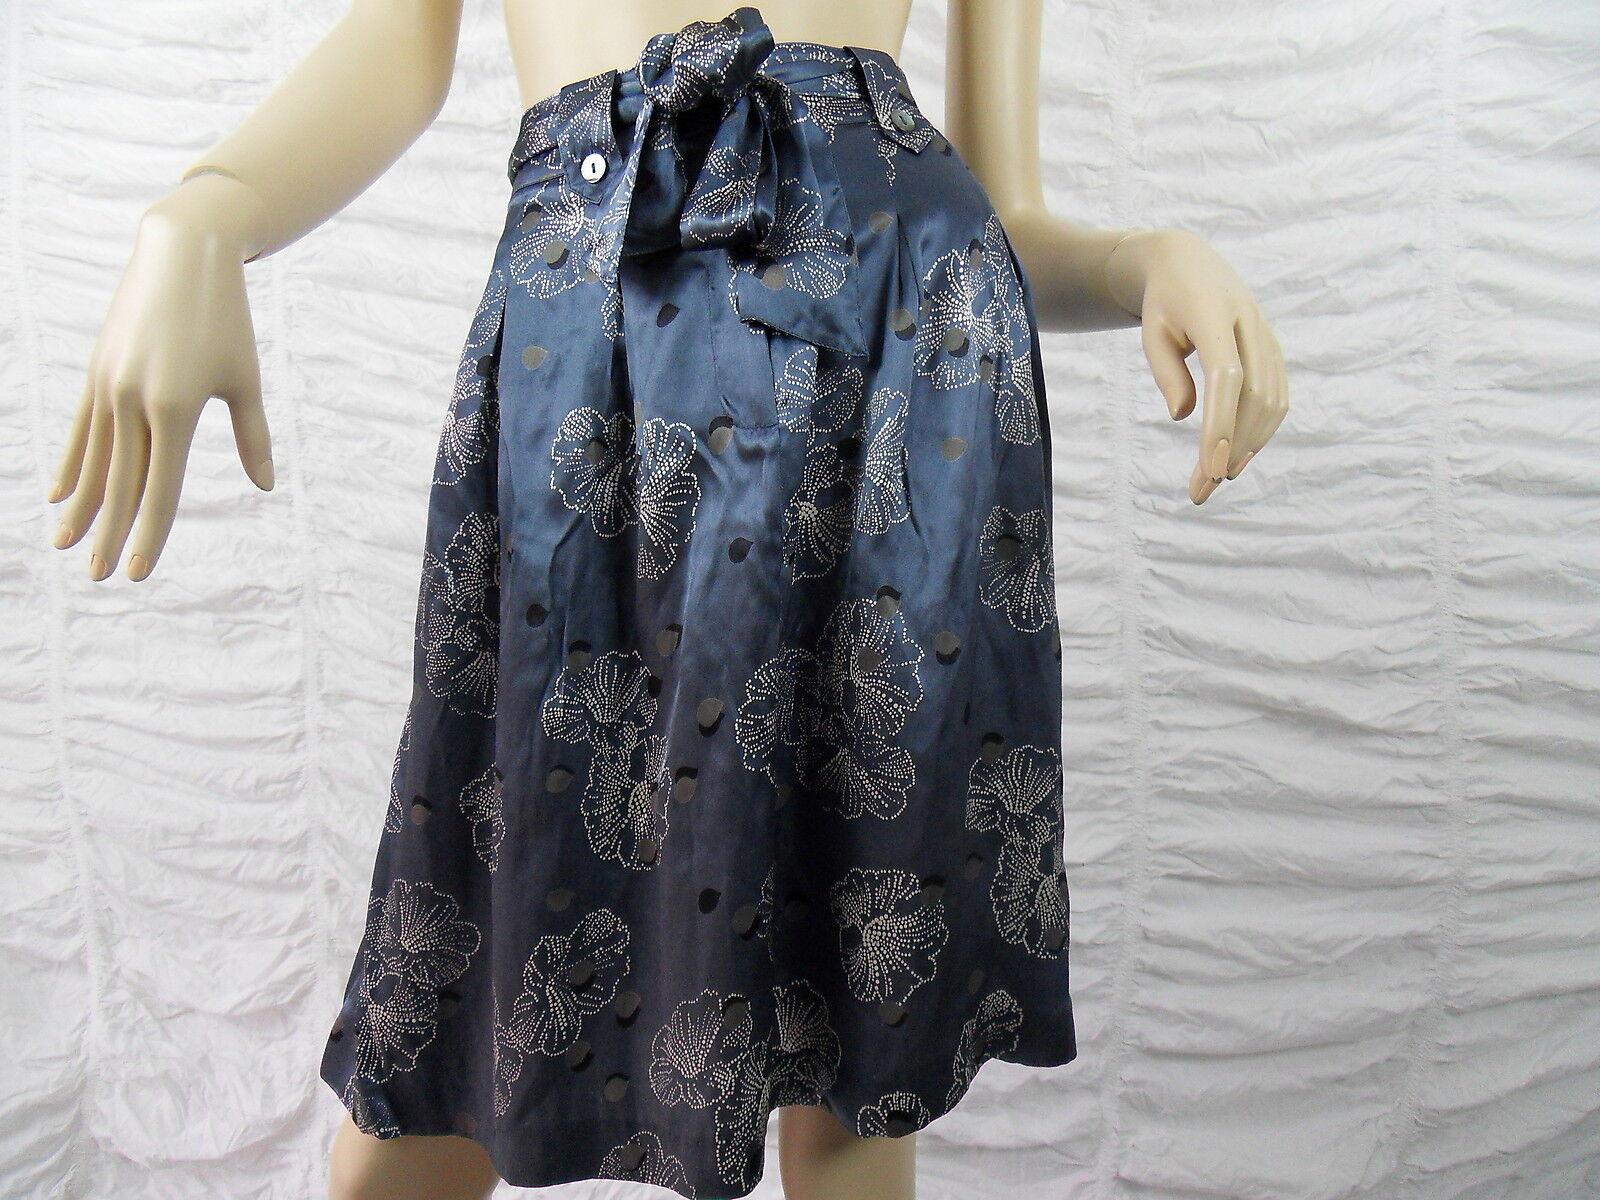 TABLE EIGHT bluee floral print 100% silk A-line skirt size 10 BNWT